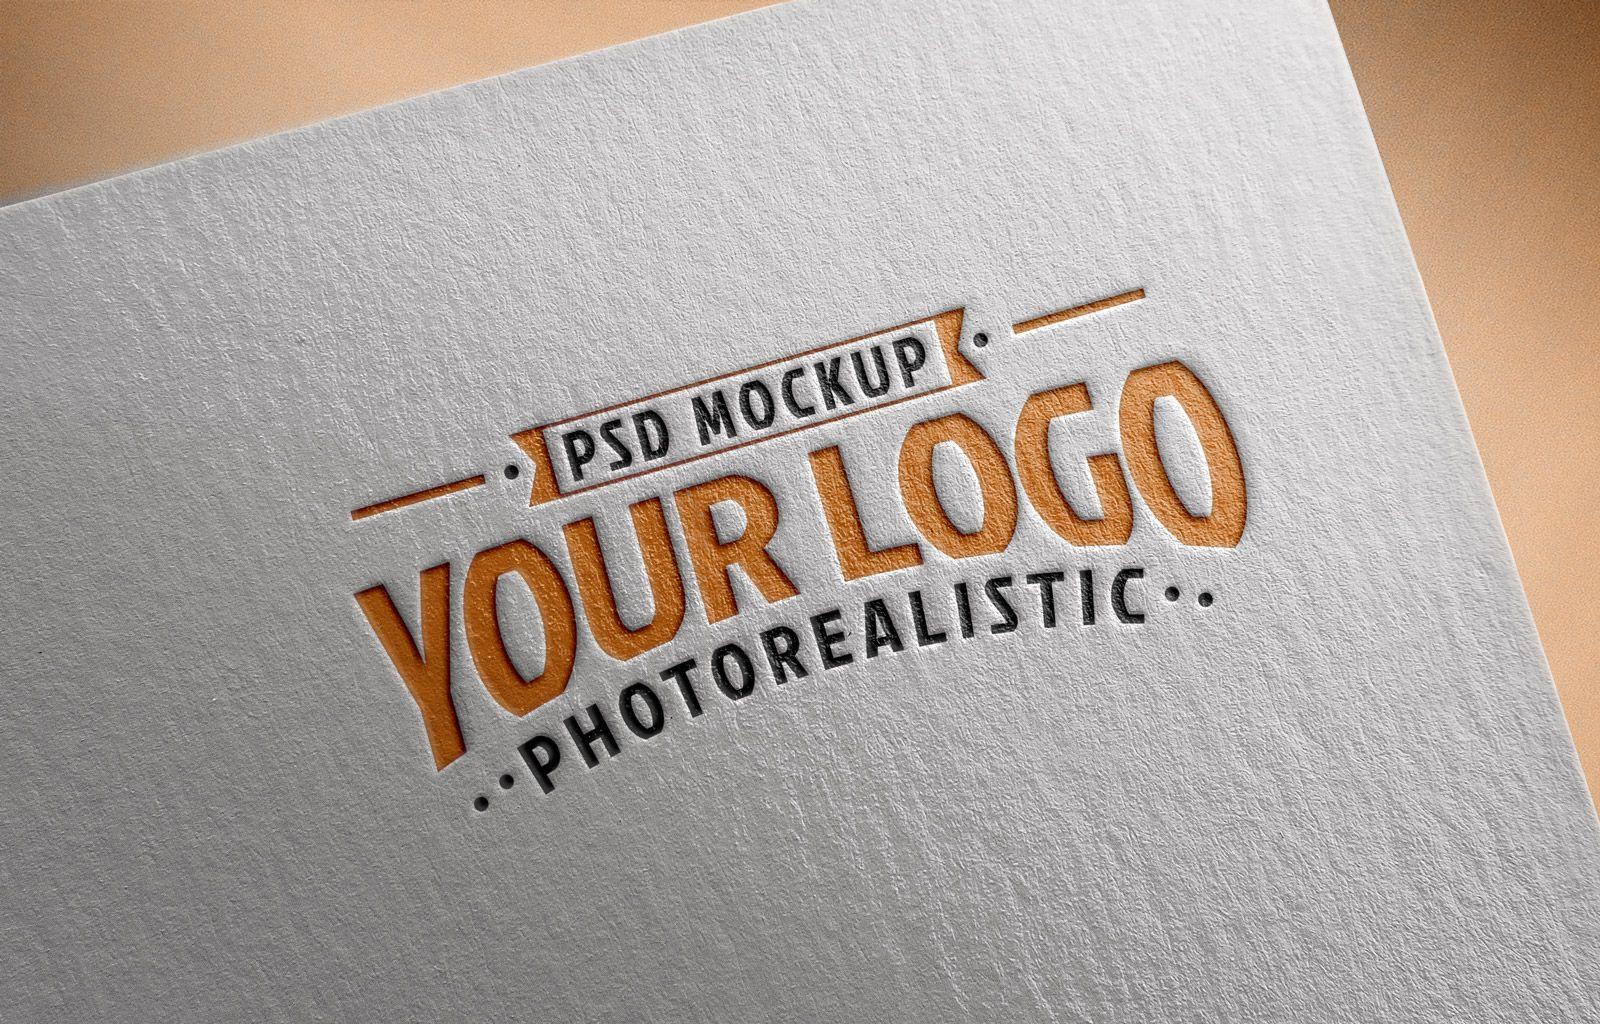 Free Logo Mockup Psd On Textured Paper Desain